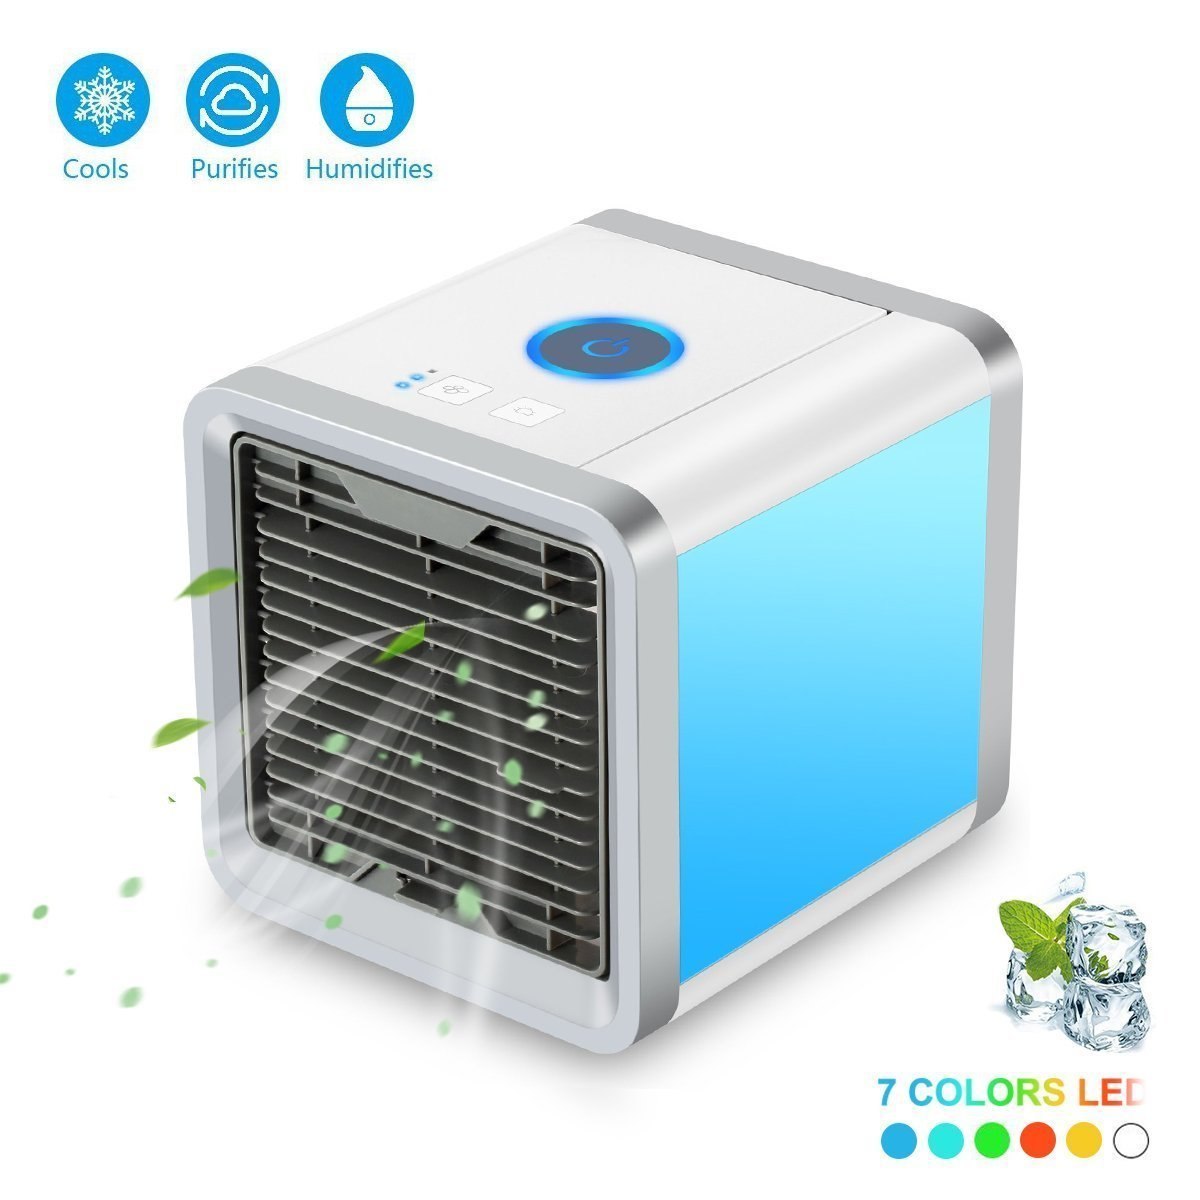 Tongfushop Mini Air Cooler Mobile Air Conditioner,Portable Air Conditioner Air Cooler, Humidifier & Air Purifier Fan with USB Port